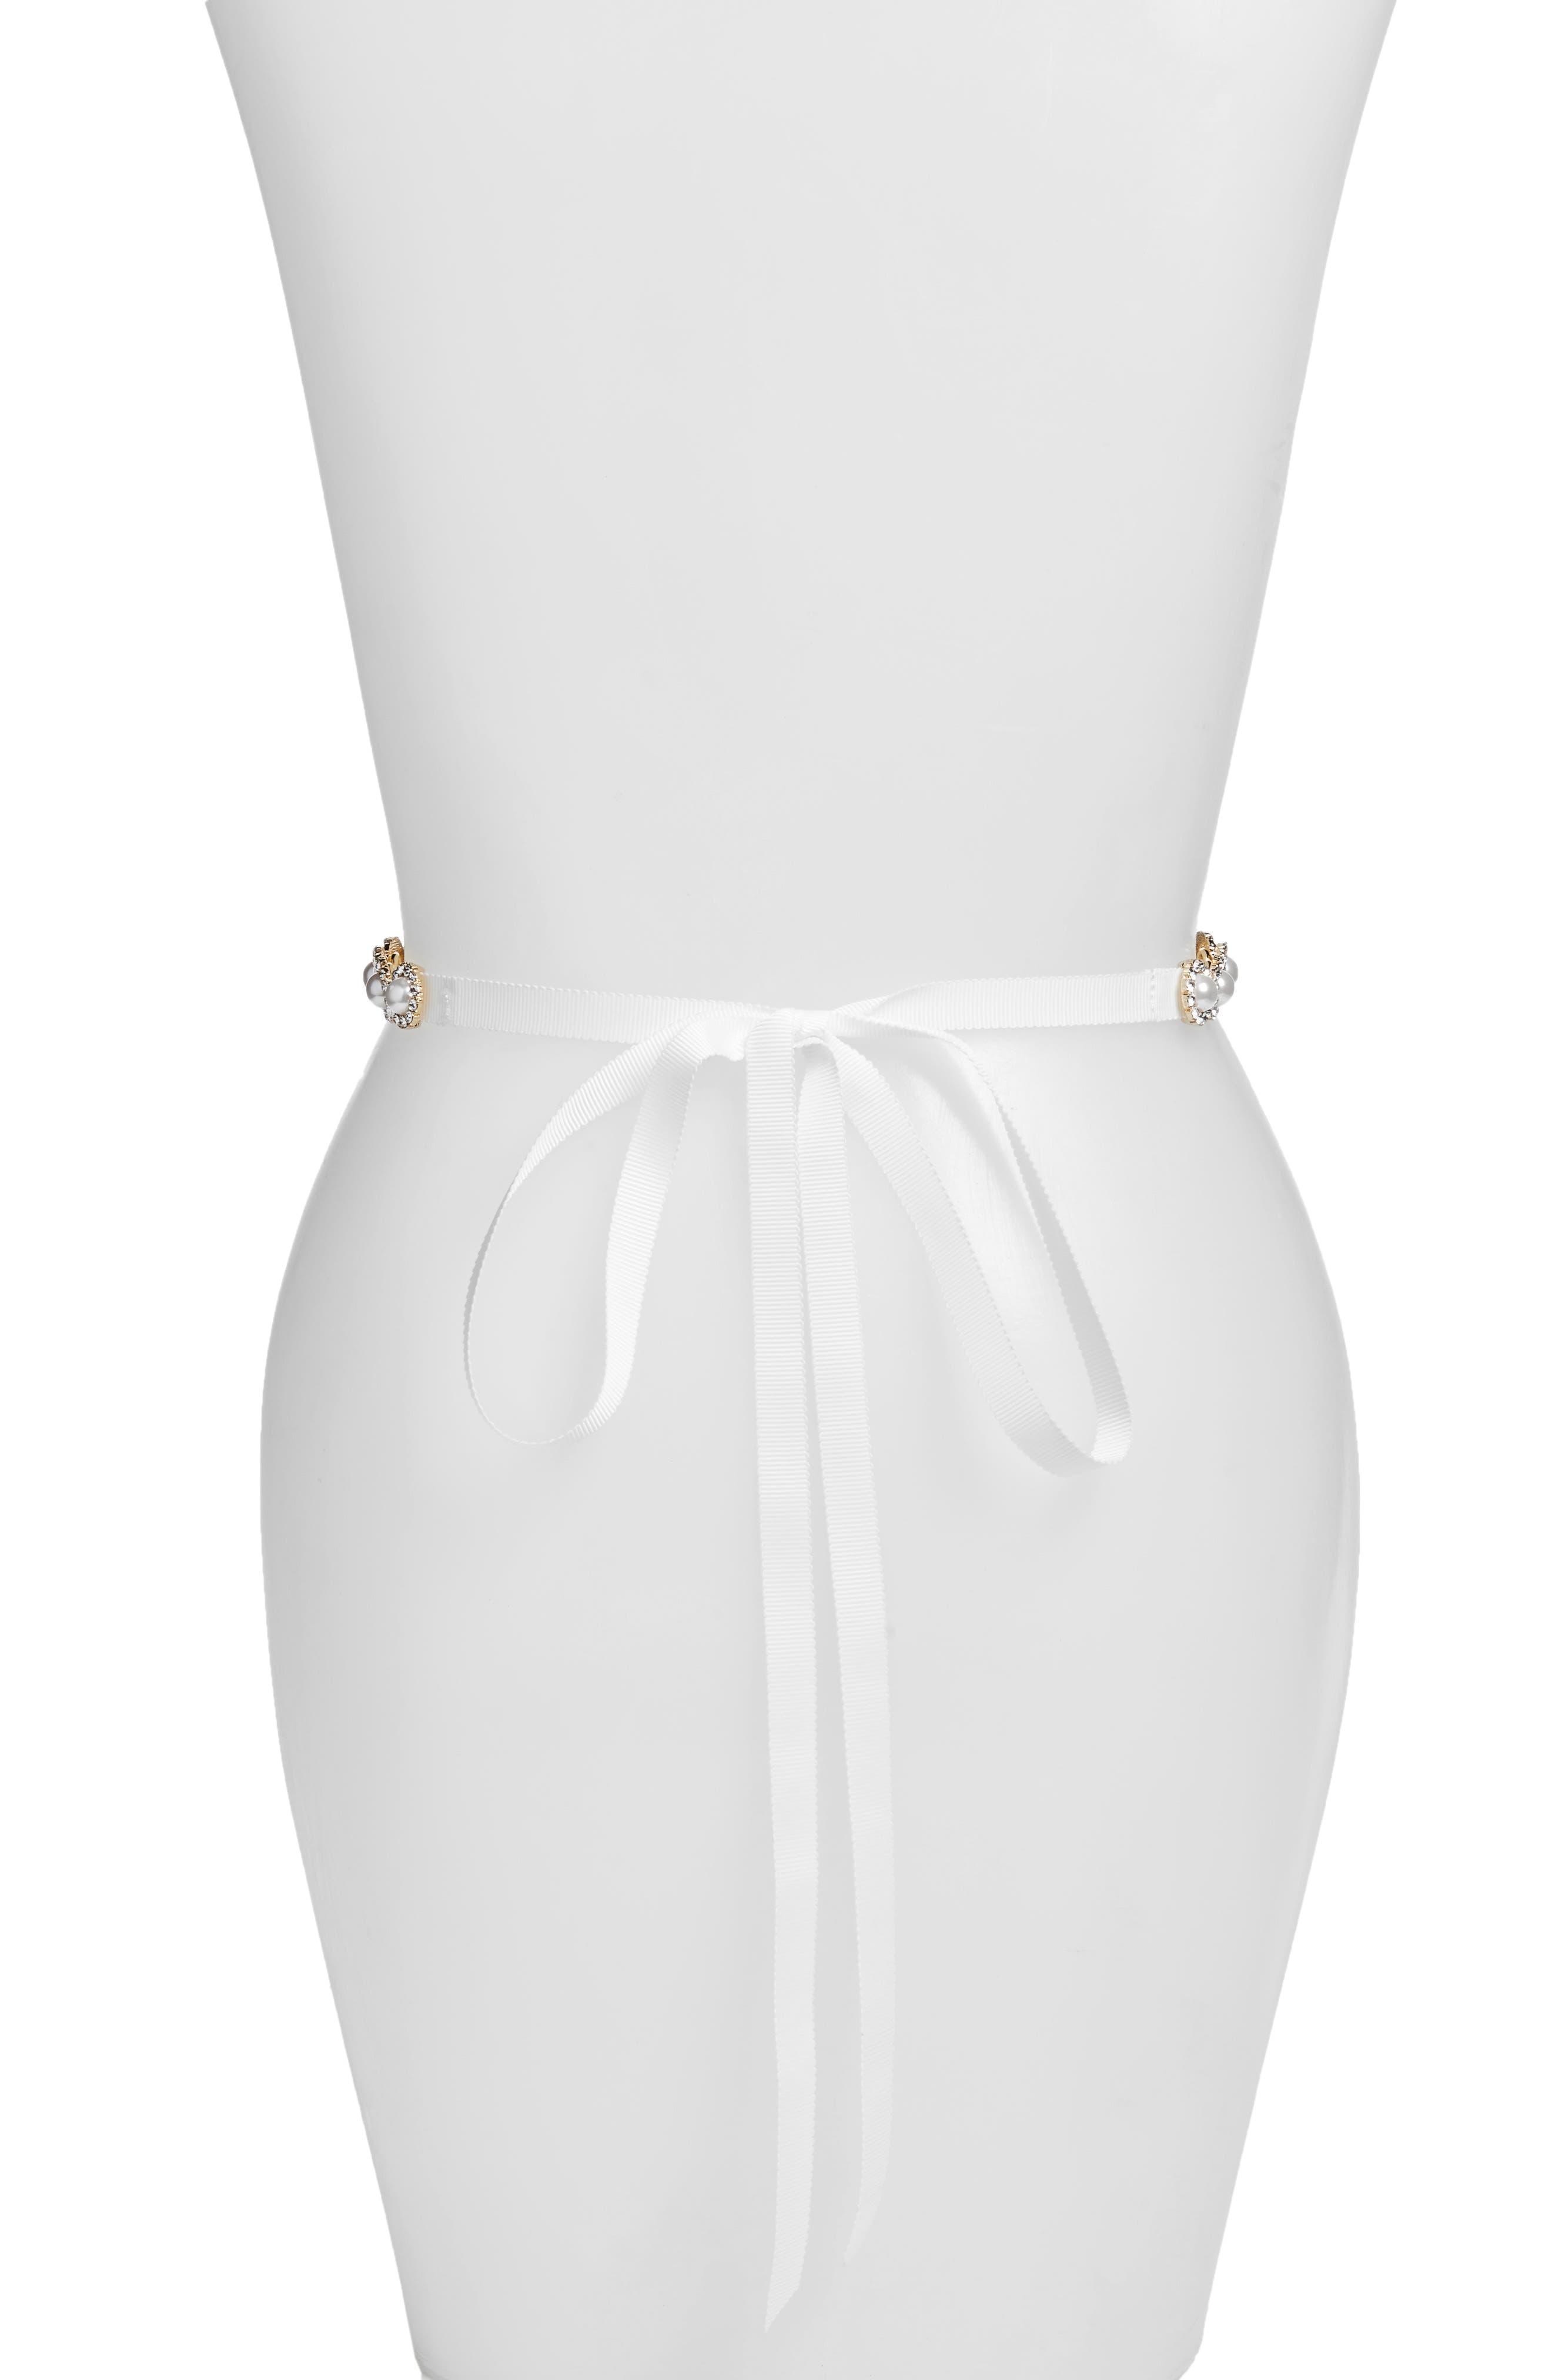 imitation pearl & crystal belt,                             Alternate thumbnail 2, color,                             Bridal Cream